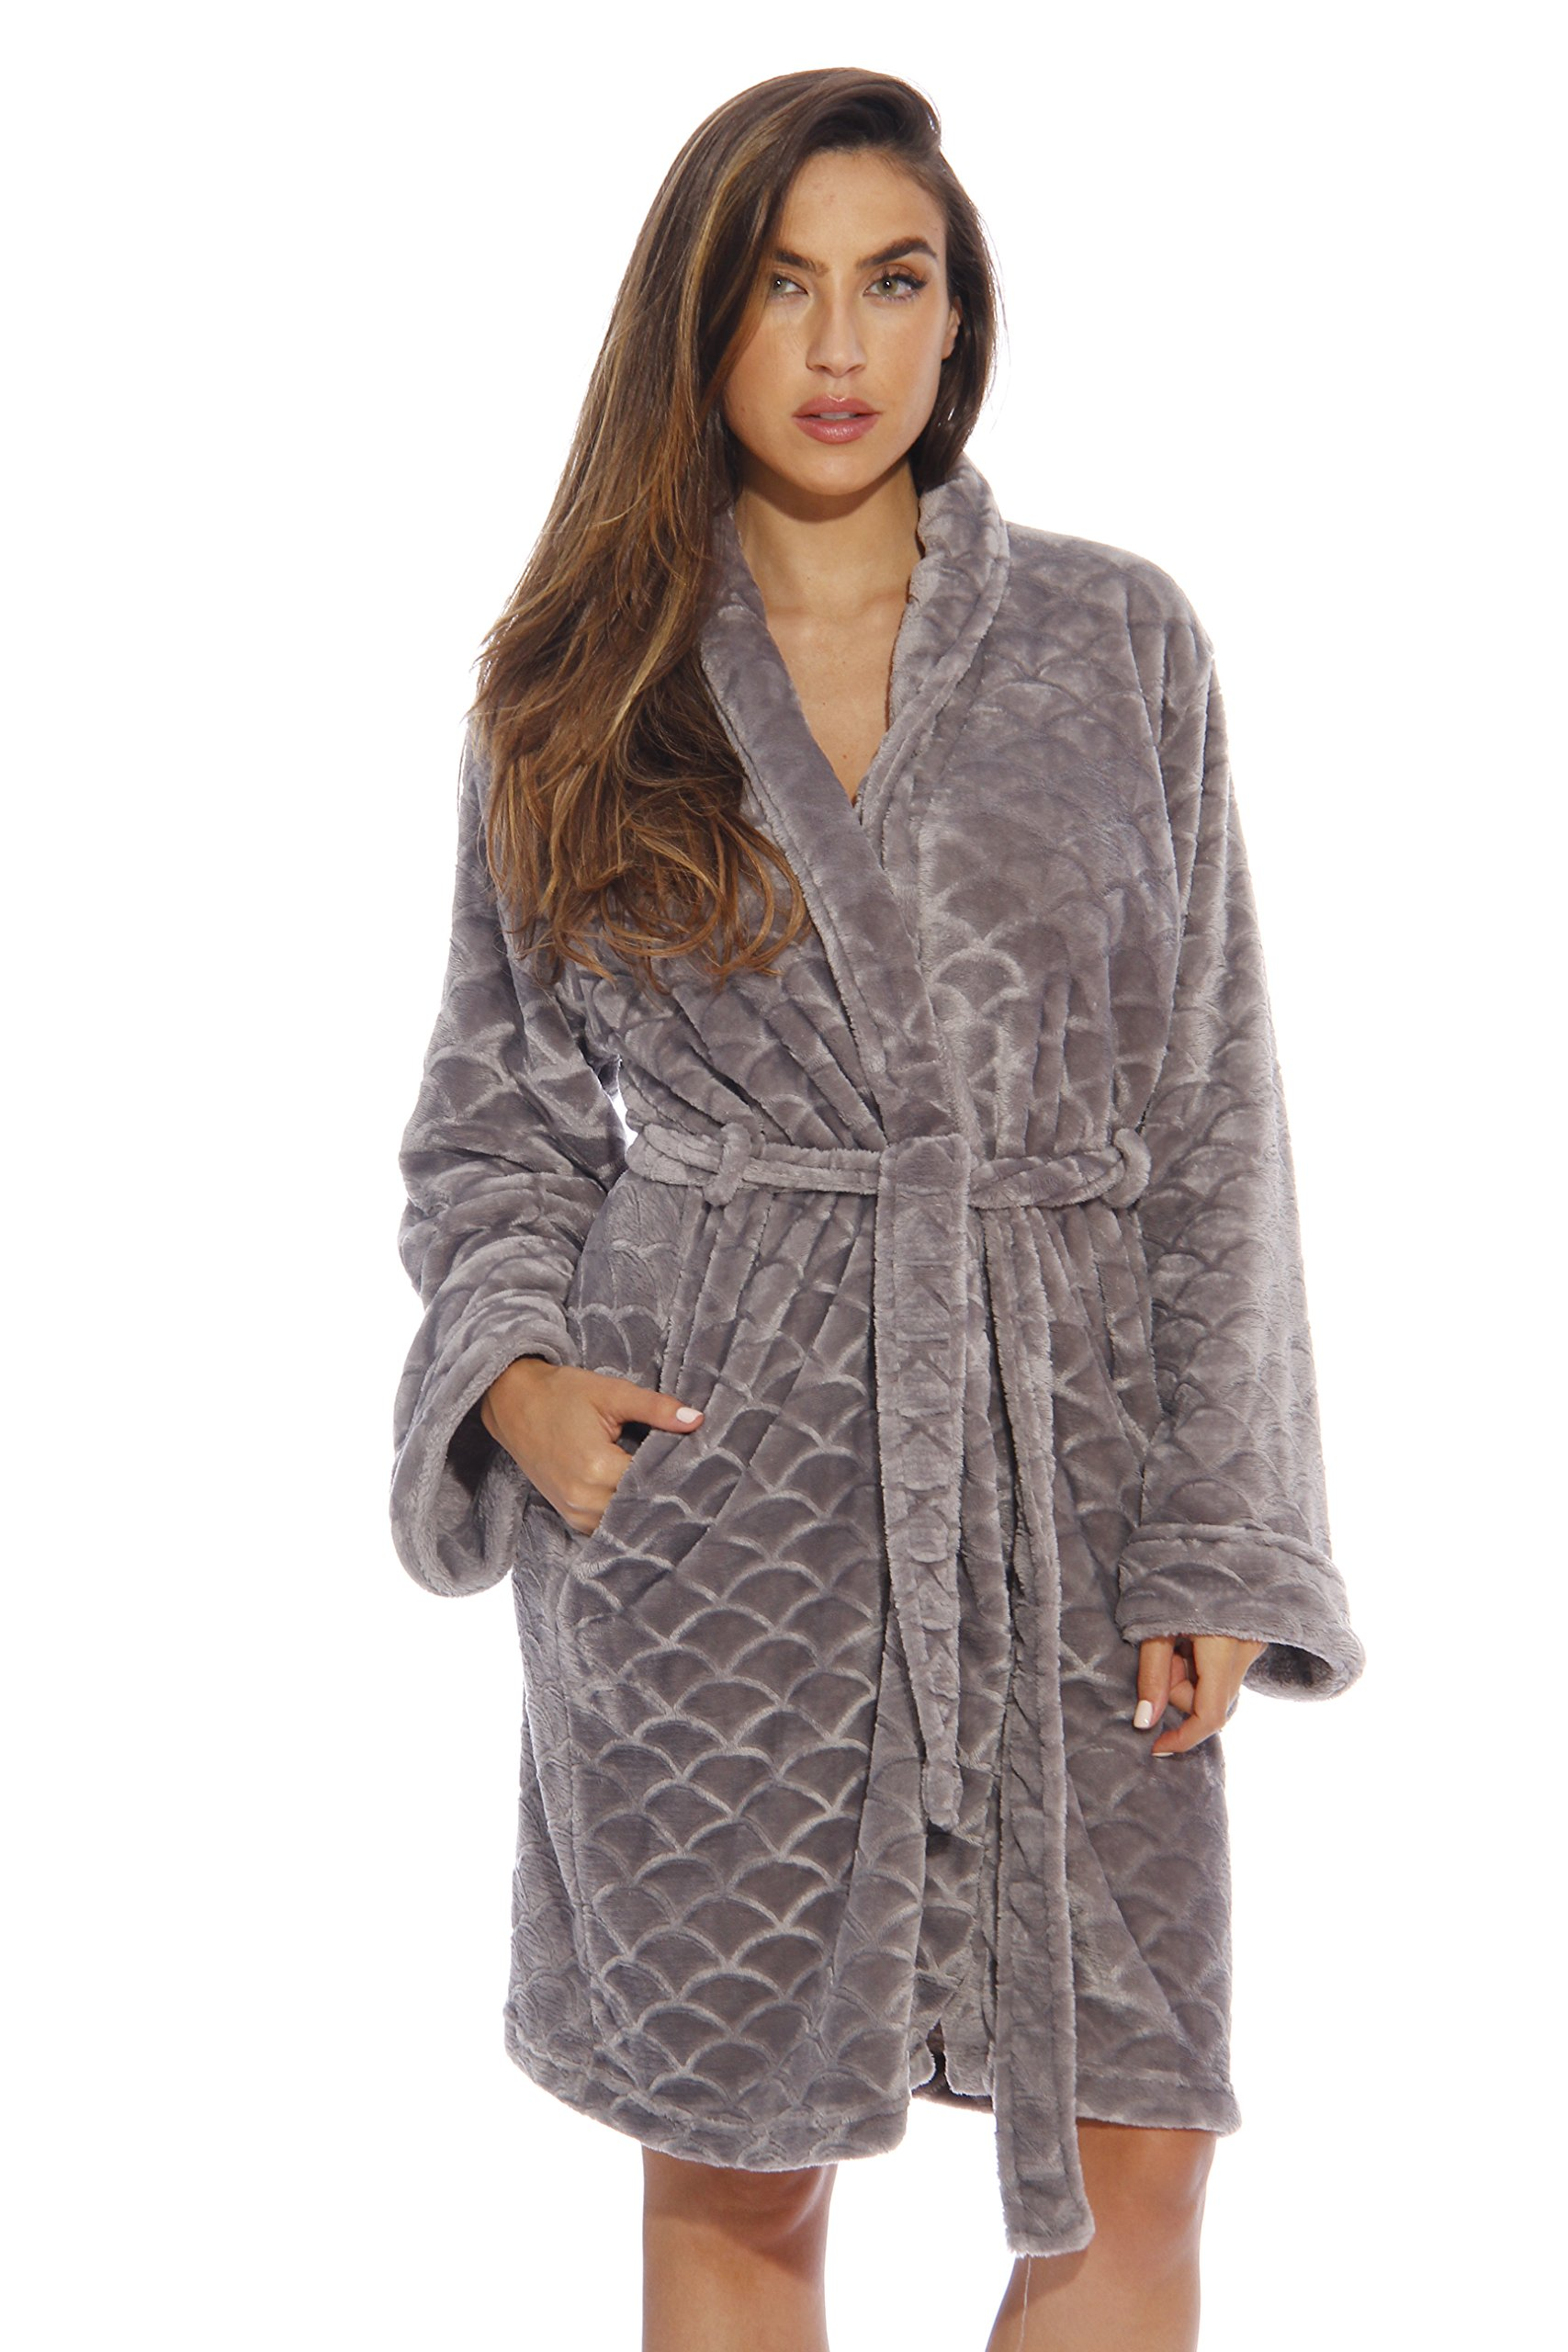 Just Love Kimono Robe / Bath Robes for Women, SizeSmall, Light Grey